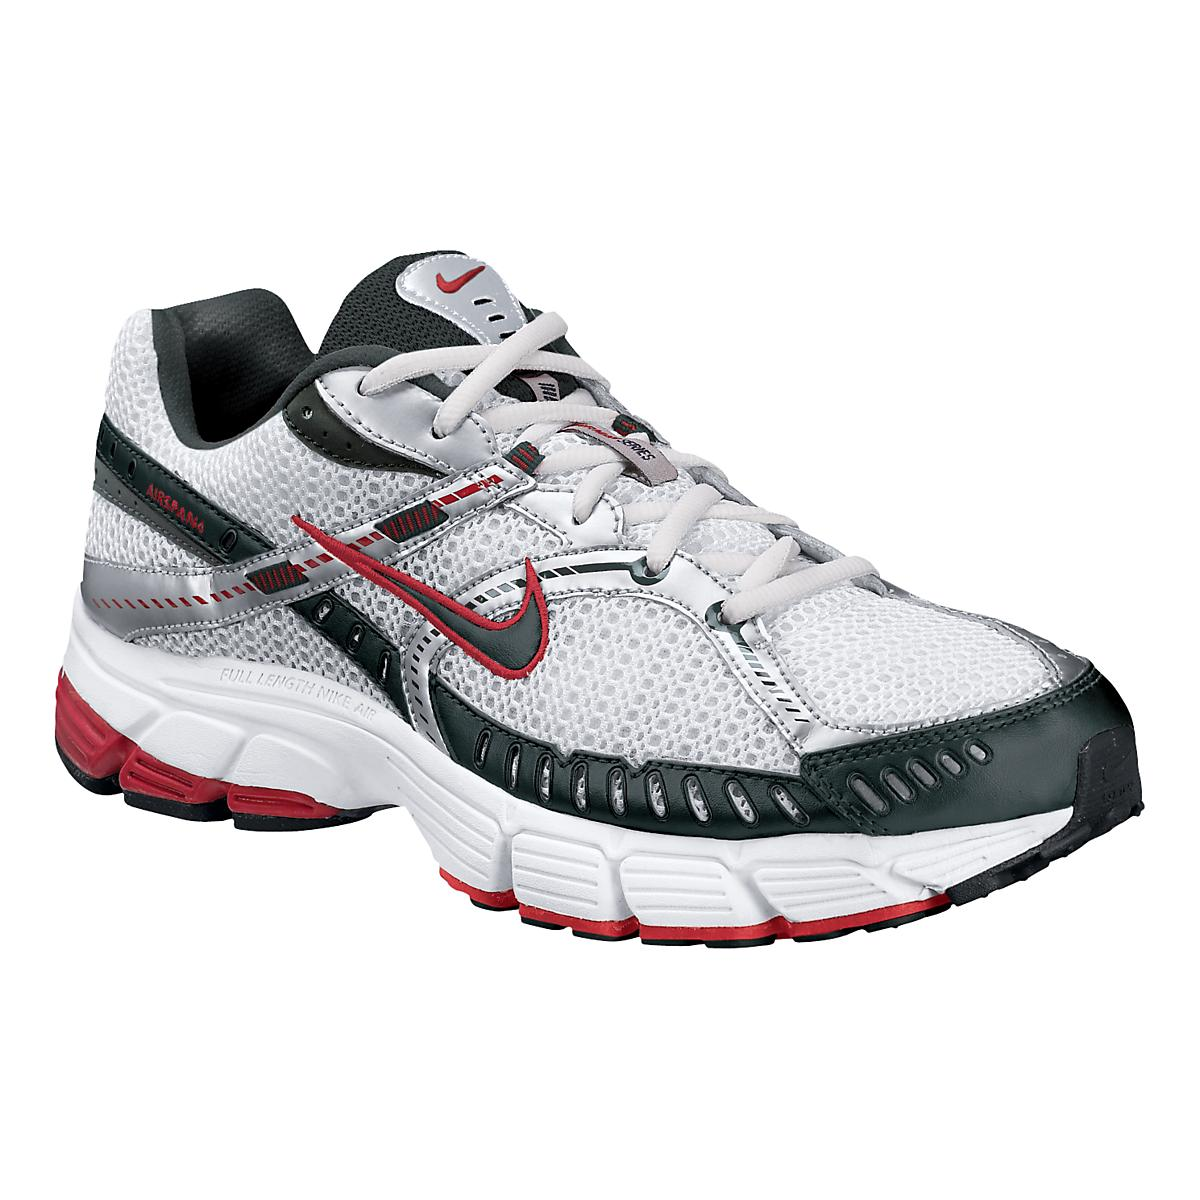 c1f9badf2 Mens Nike Air Span+ 4 Running Shoe at Road Runner Sports